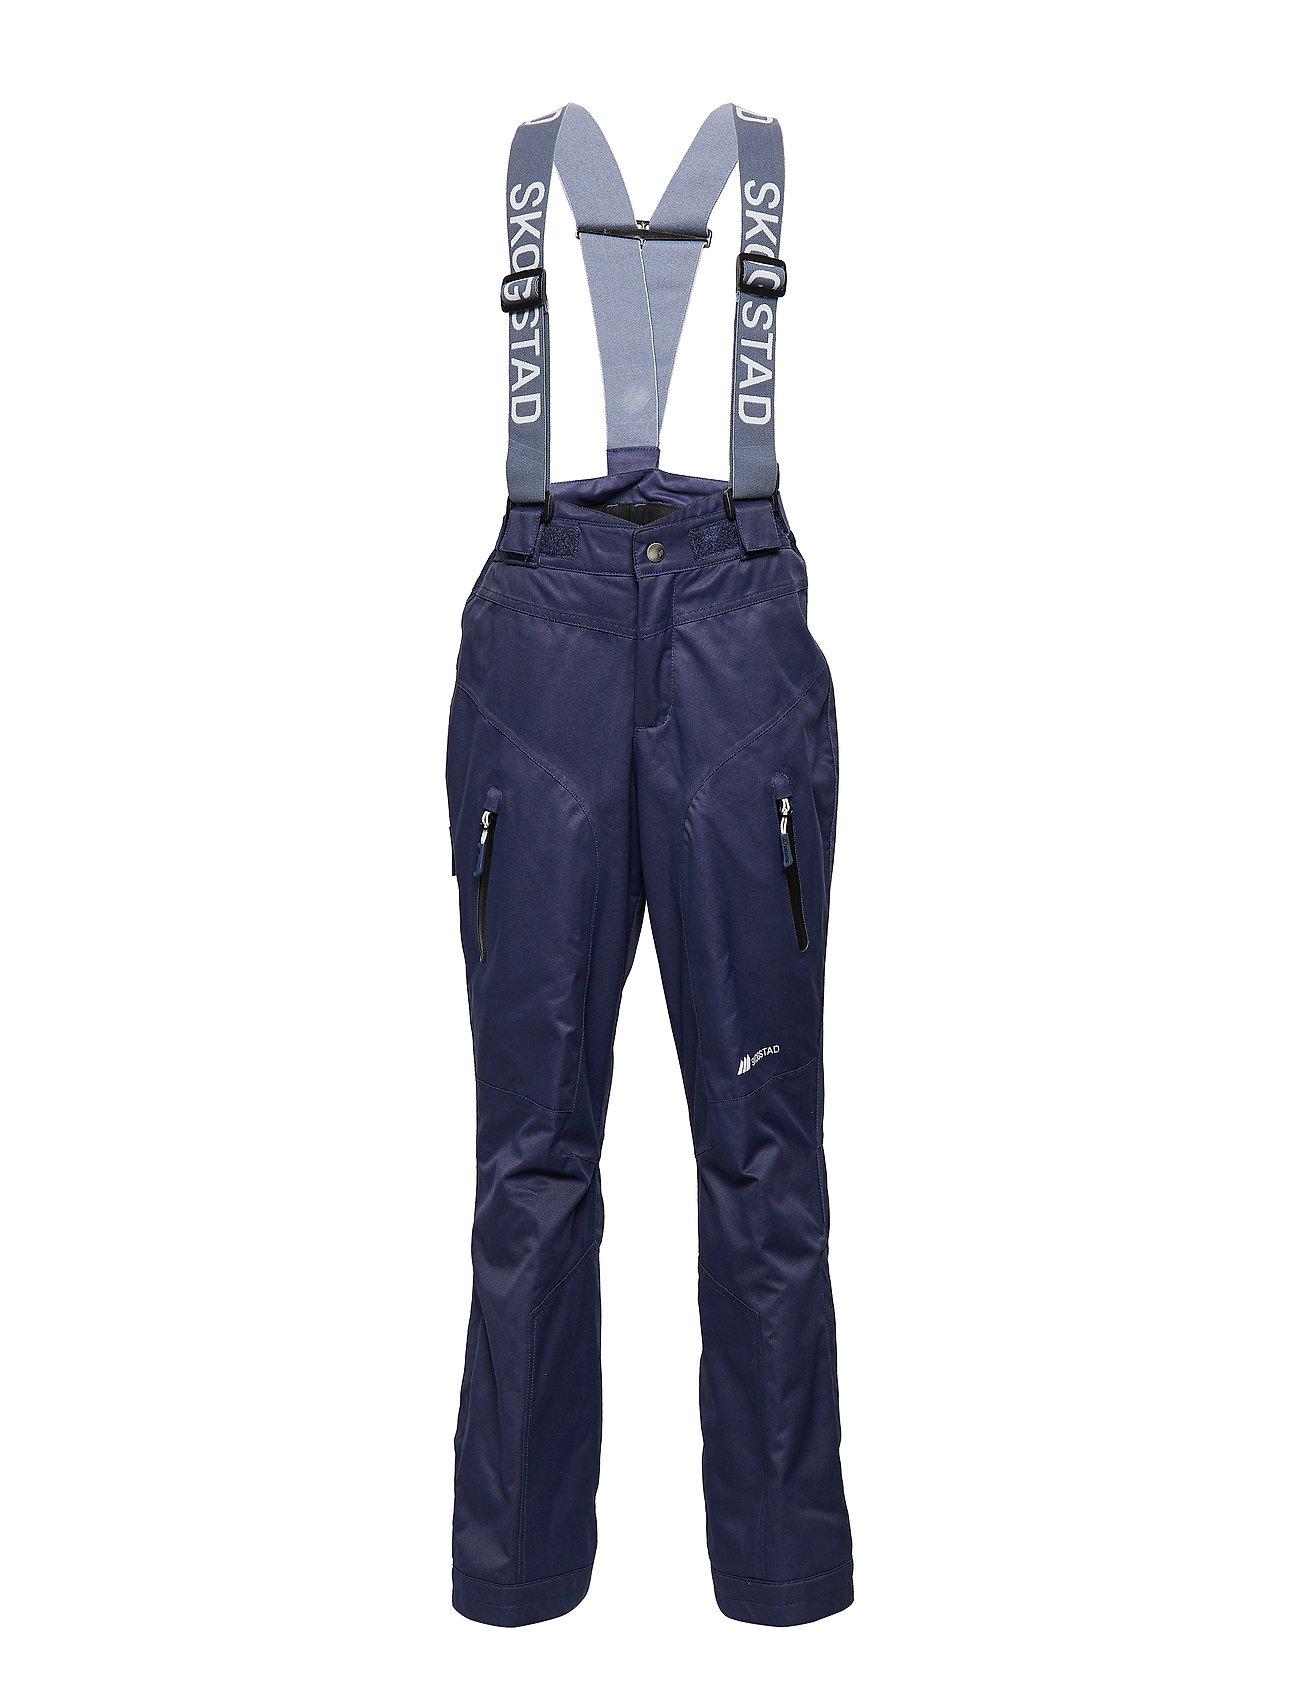 Skogstad Gaustadblikk 2-layer technical ski trousers - PRIME NAVY